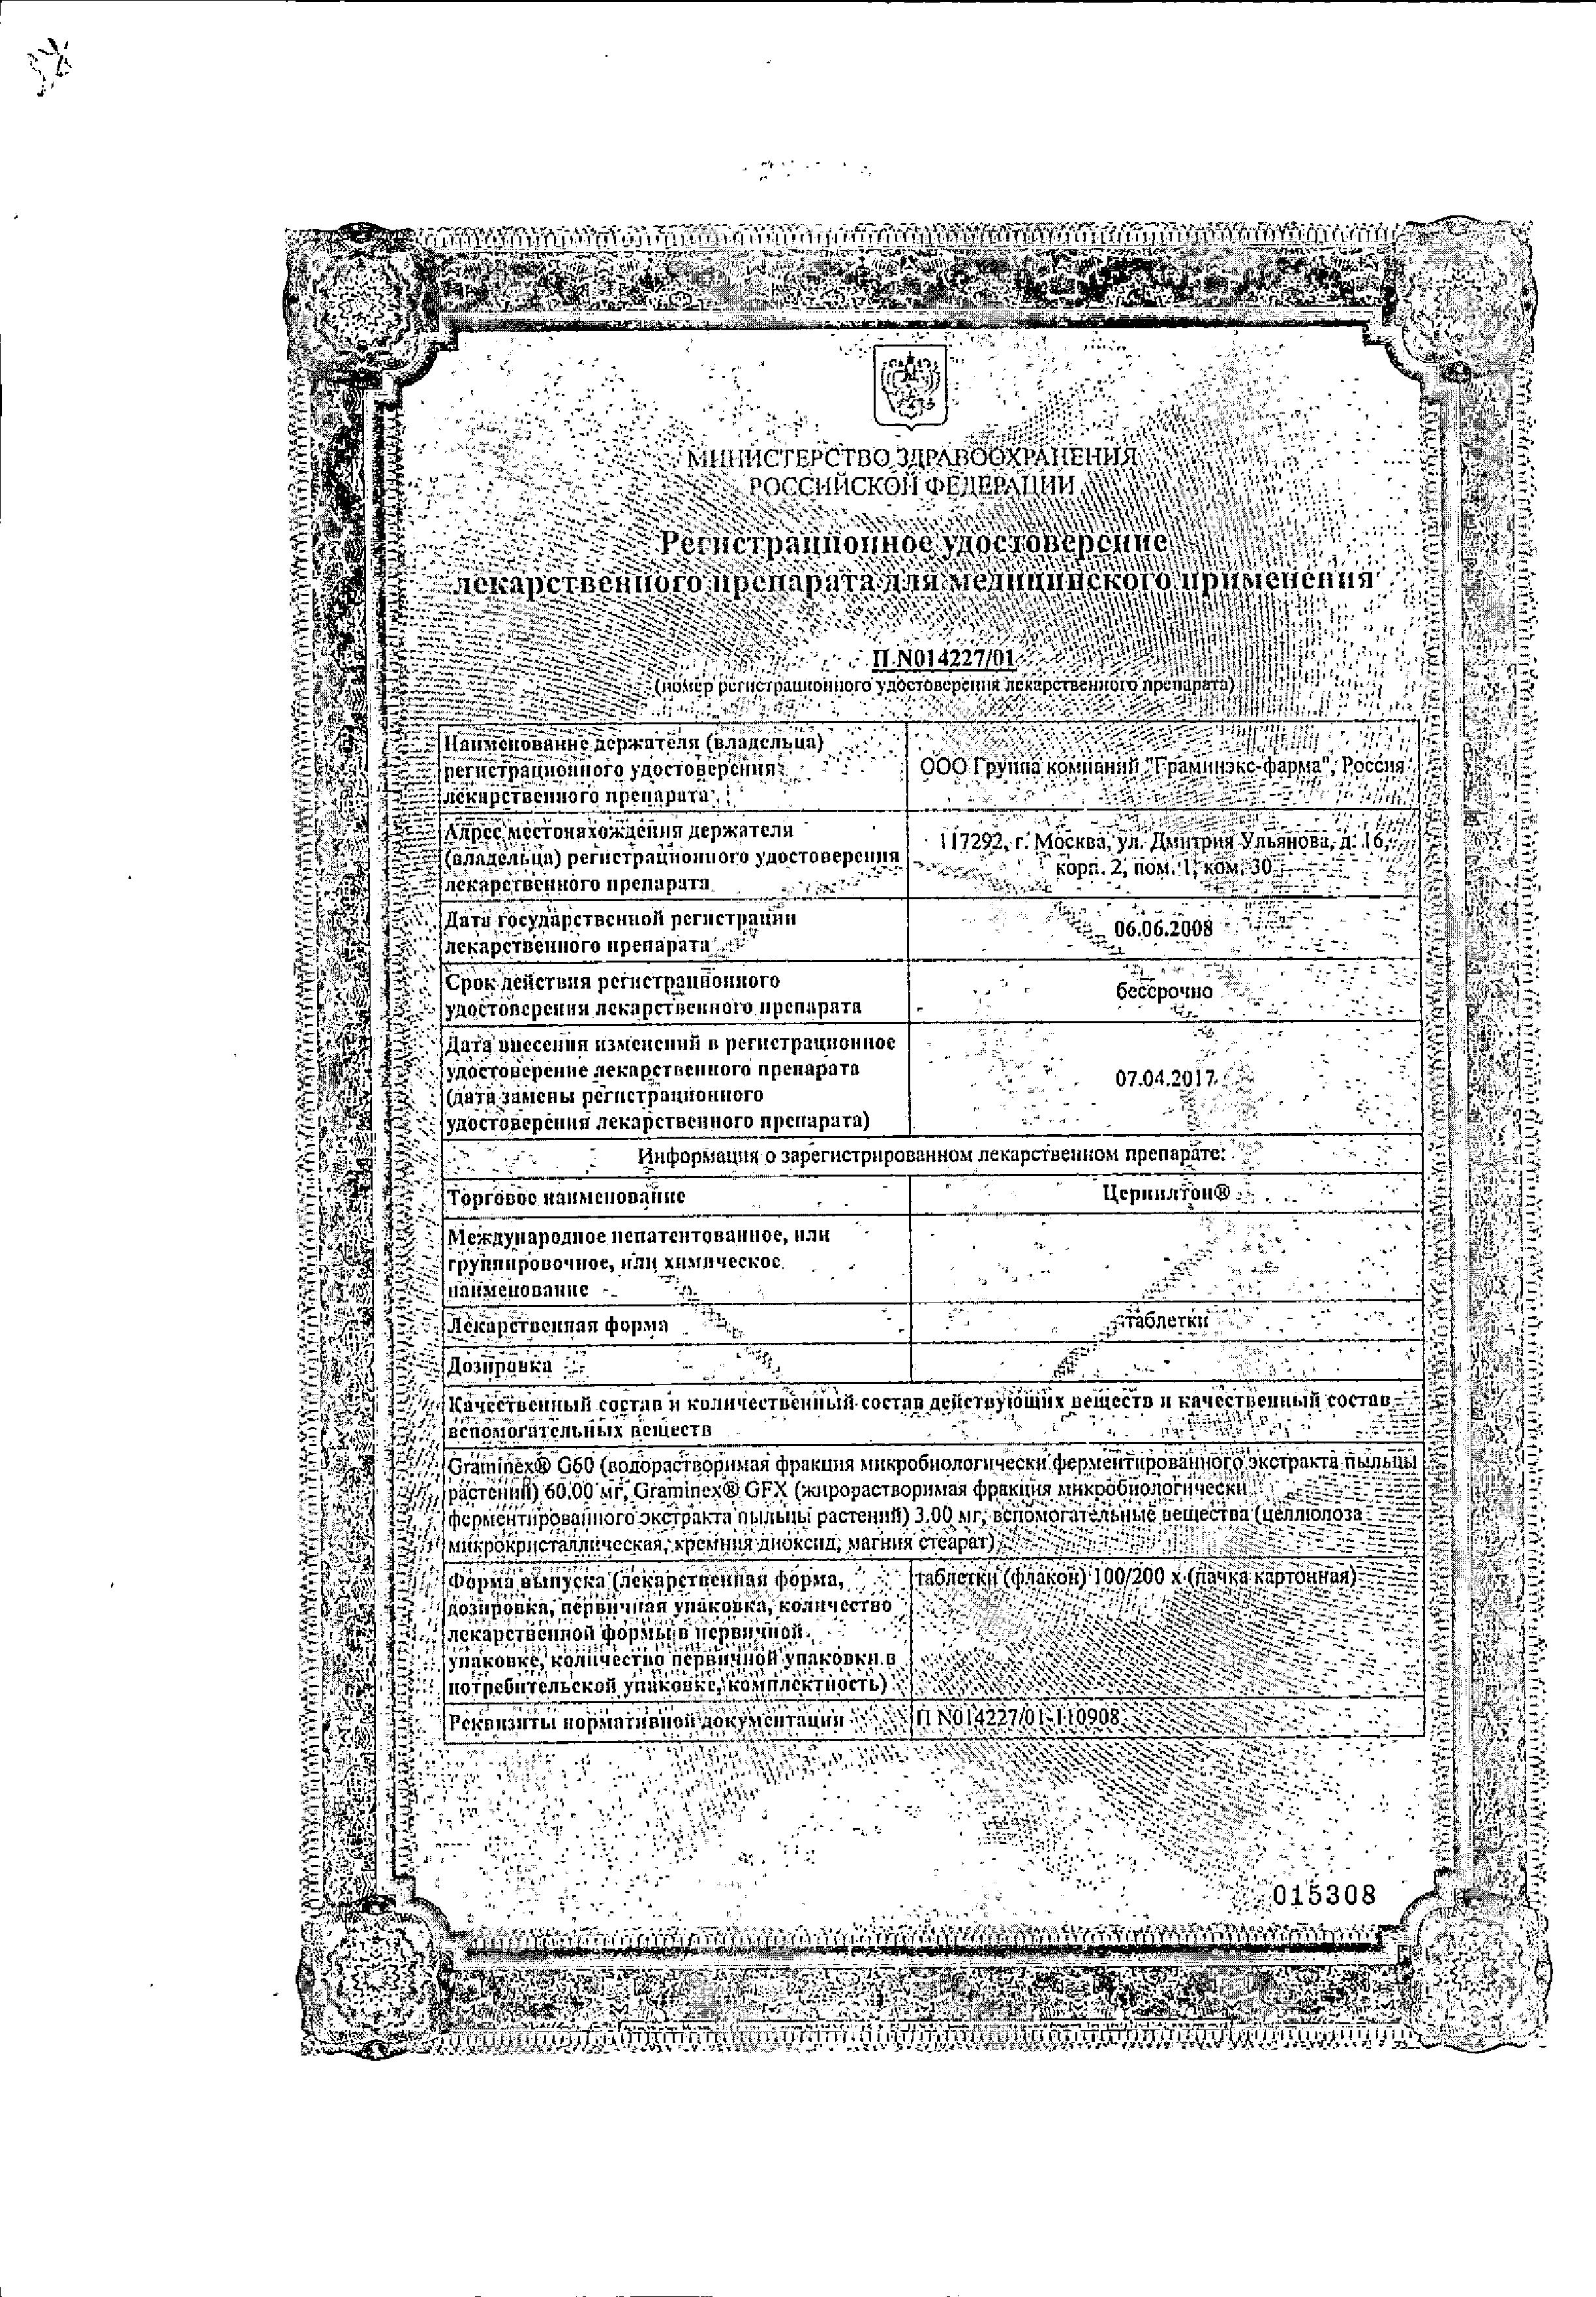 Цернилтон сертификат